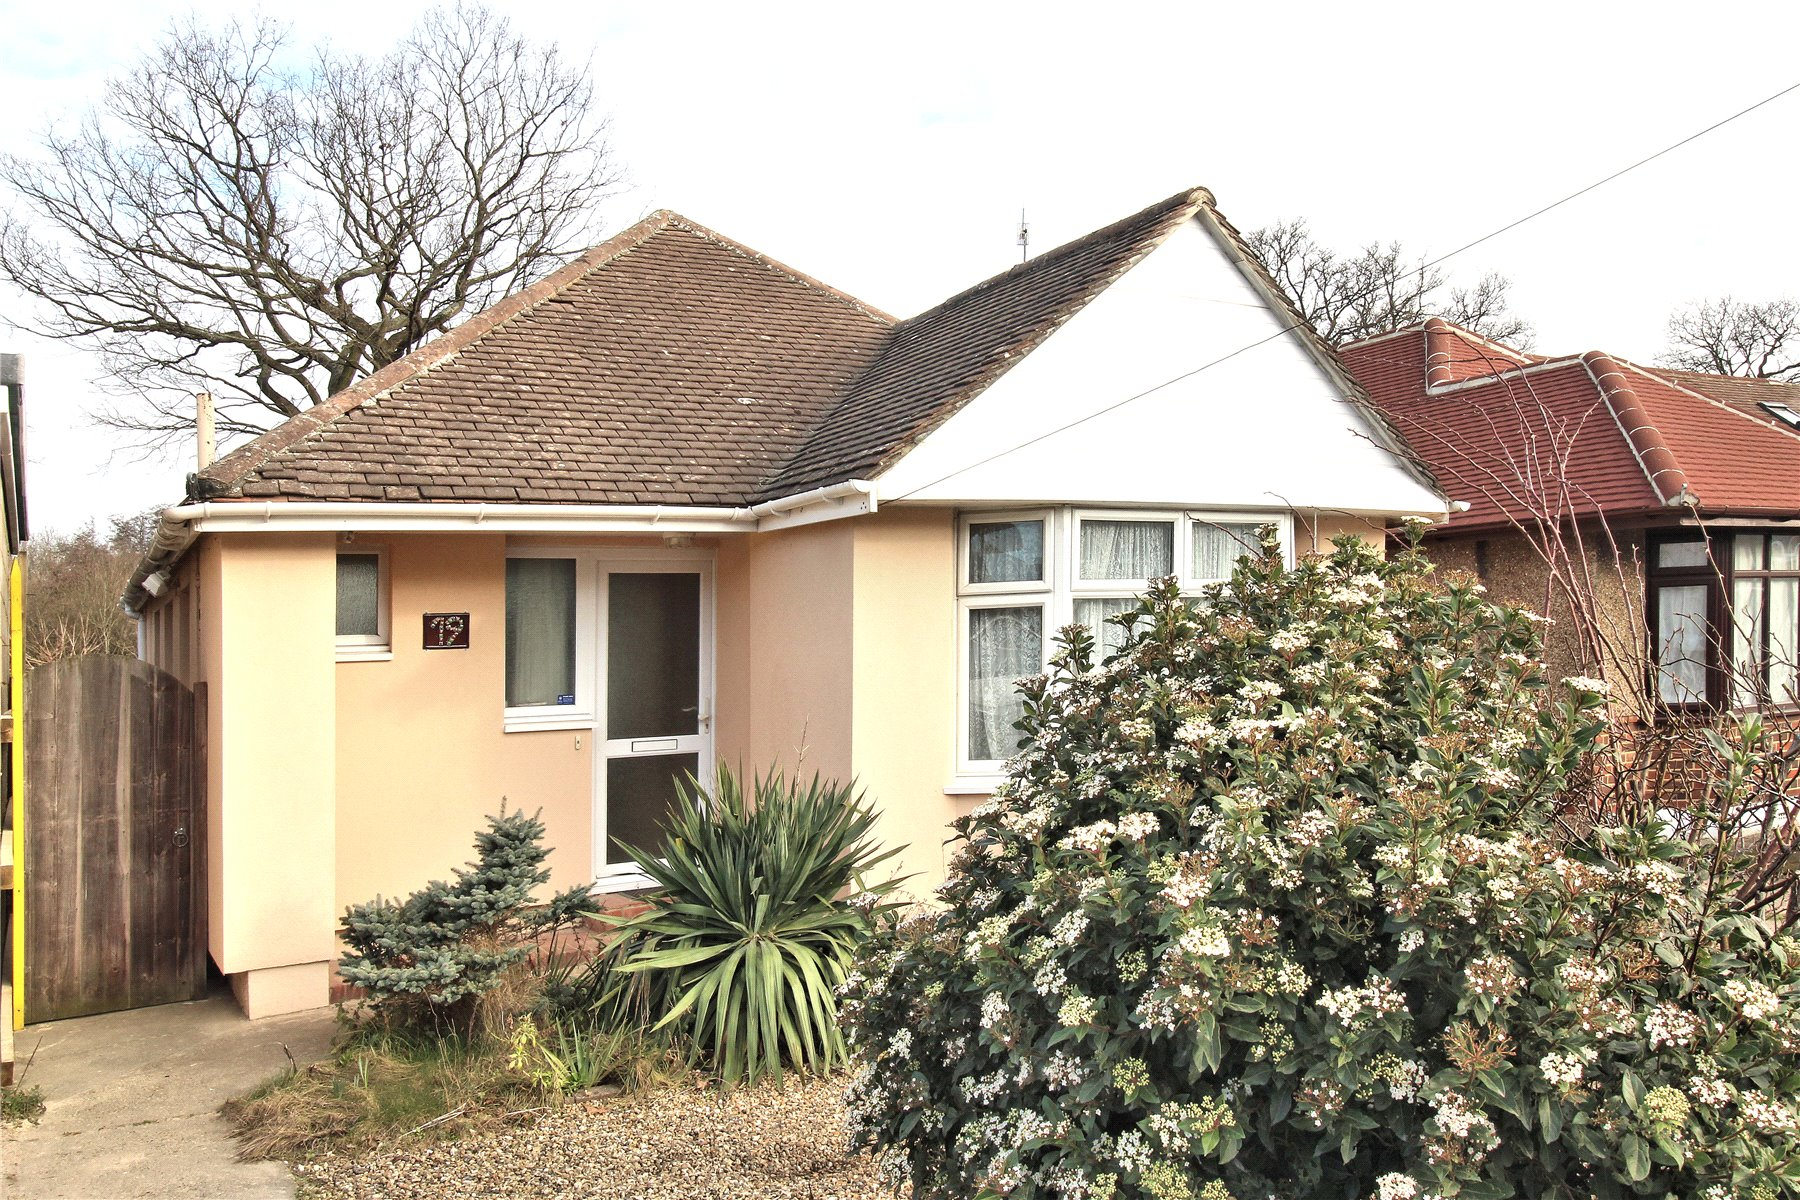 3 Bedrooms Detached Bungalow for sale in Fairfax Road, Woking, Surrey, GU22